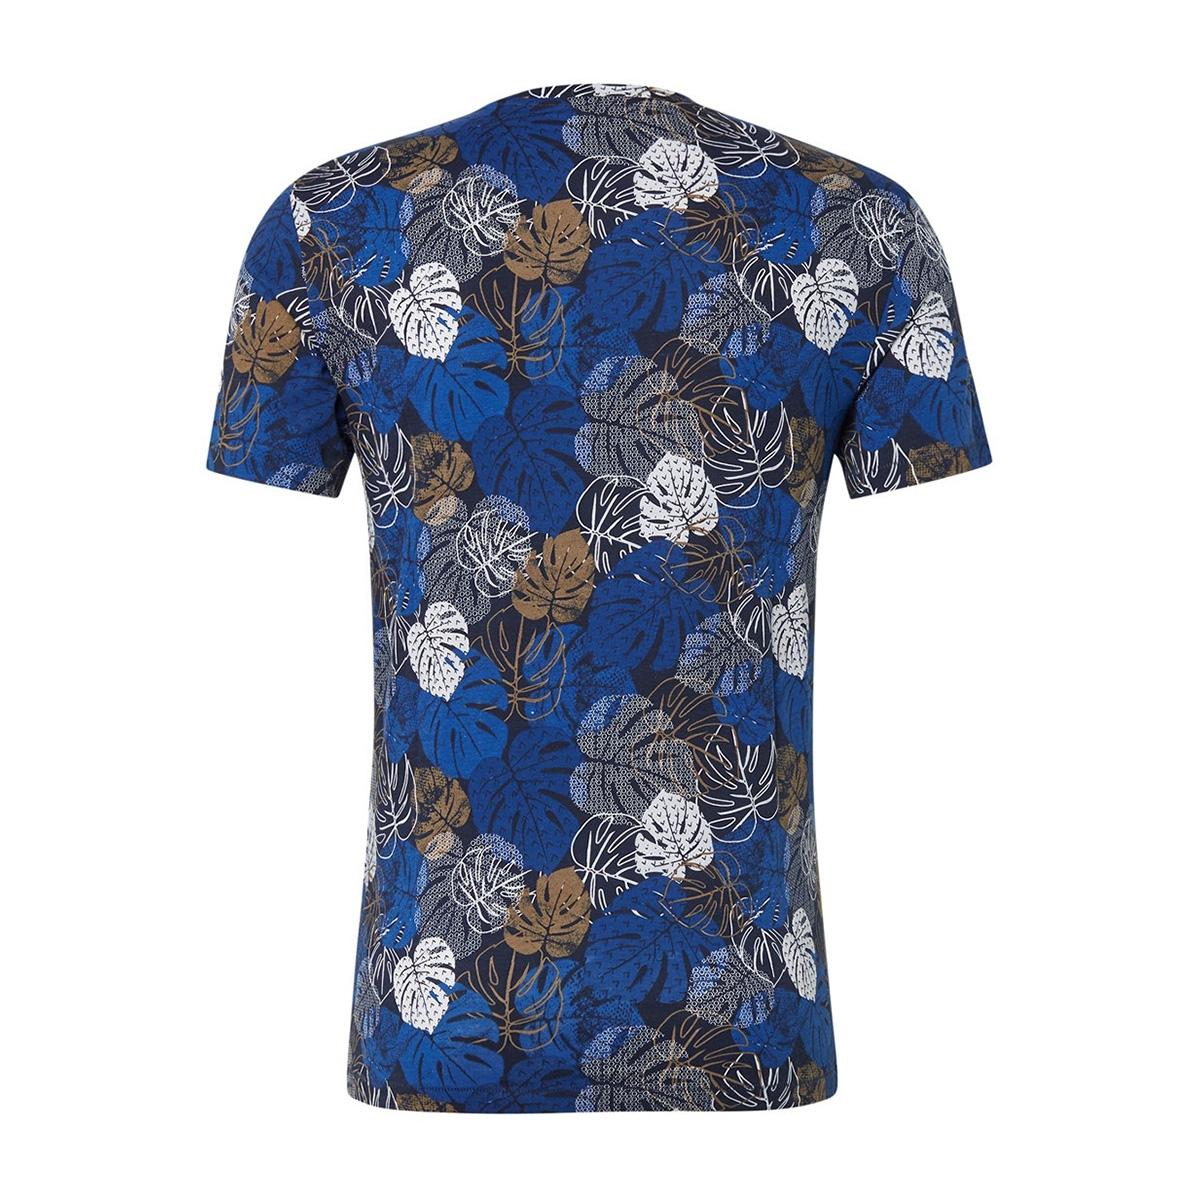 t shirt met all over print 1011499xx10 tom tailor t-shirt 17991